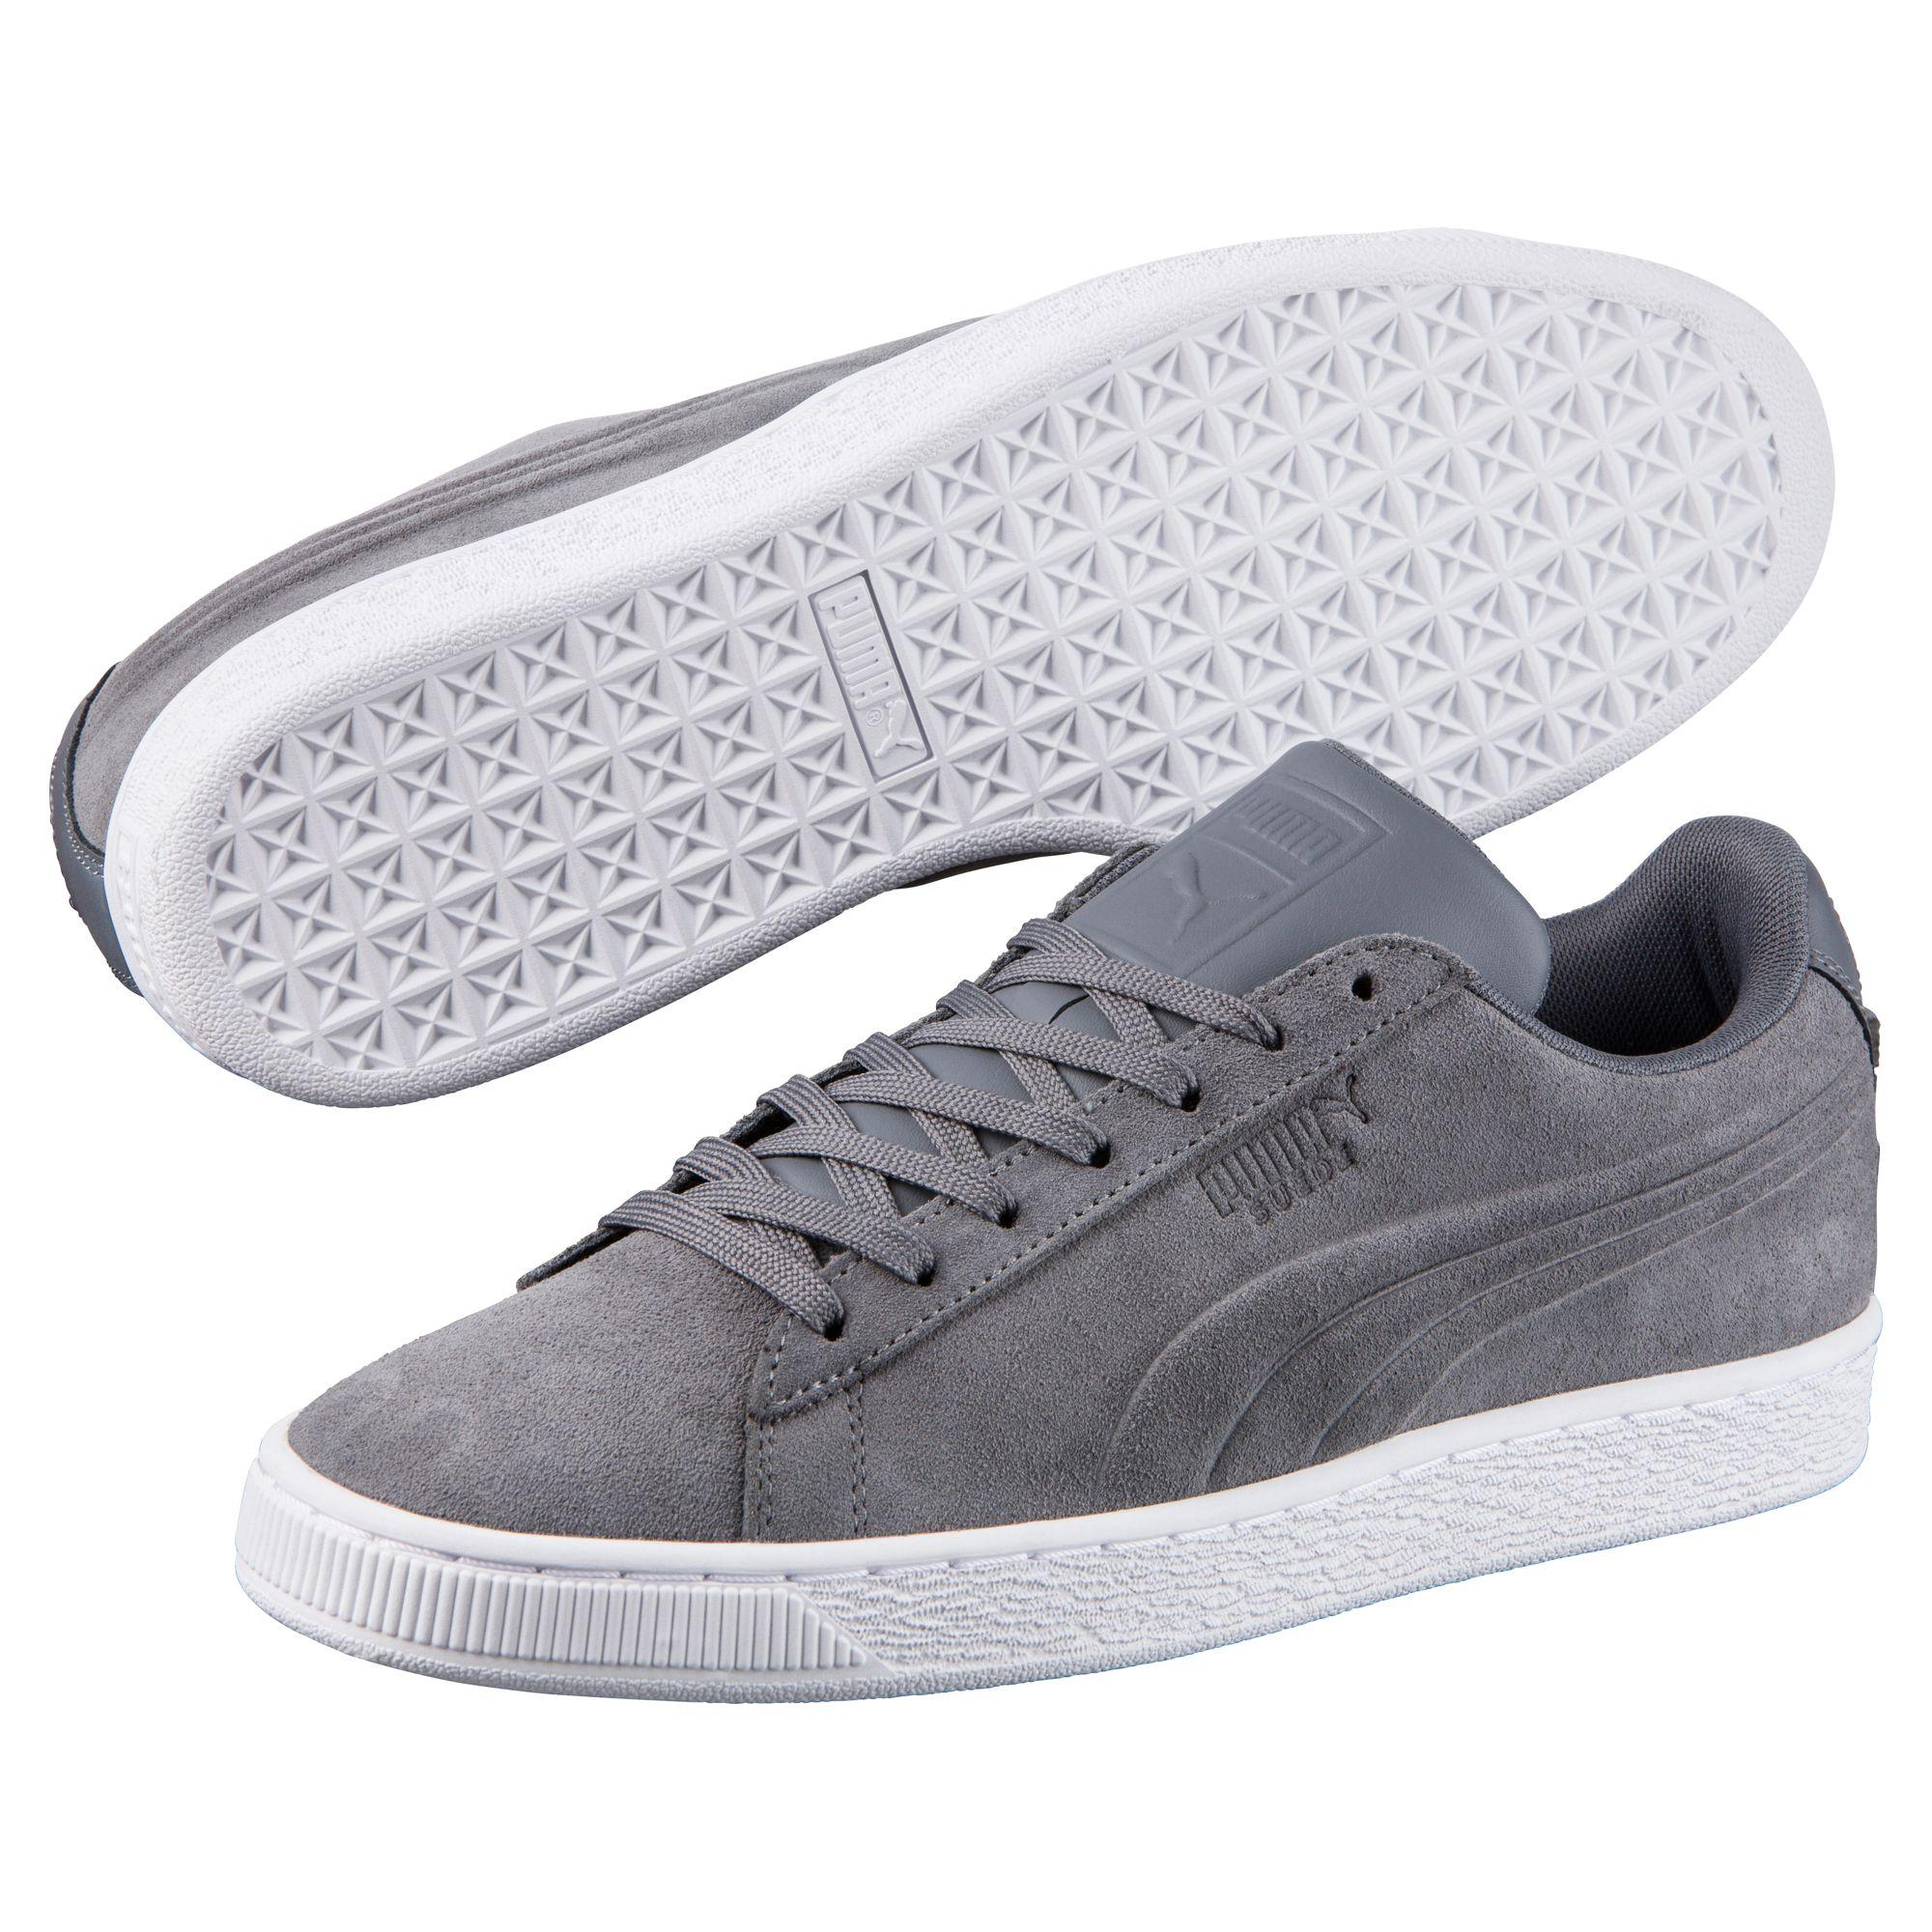 PUMA Suede Classic Embossed Trainers Unisex Zapatos Clásicos del deporte Nuevo